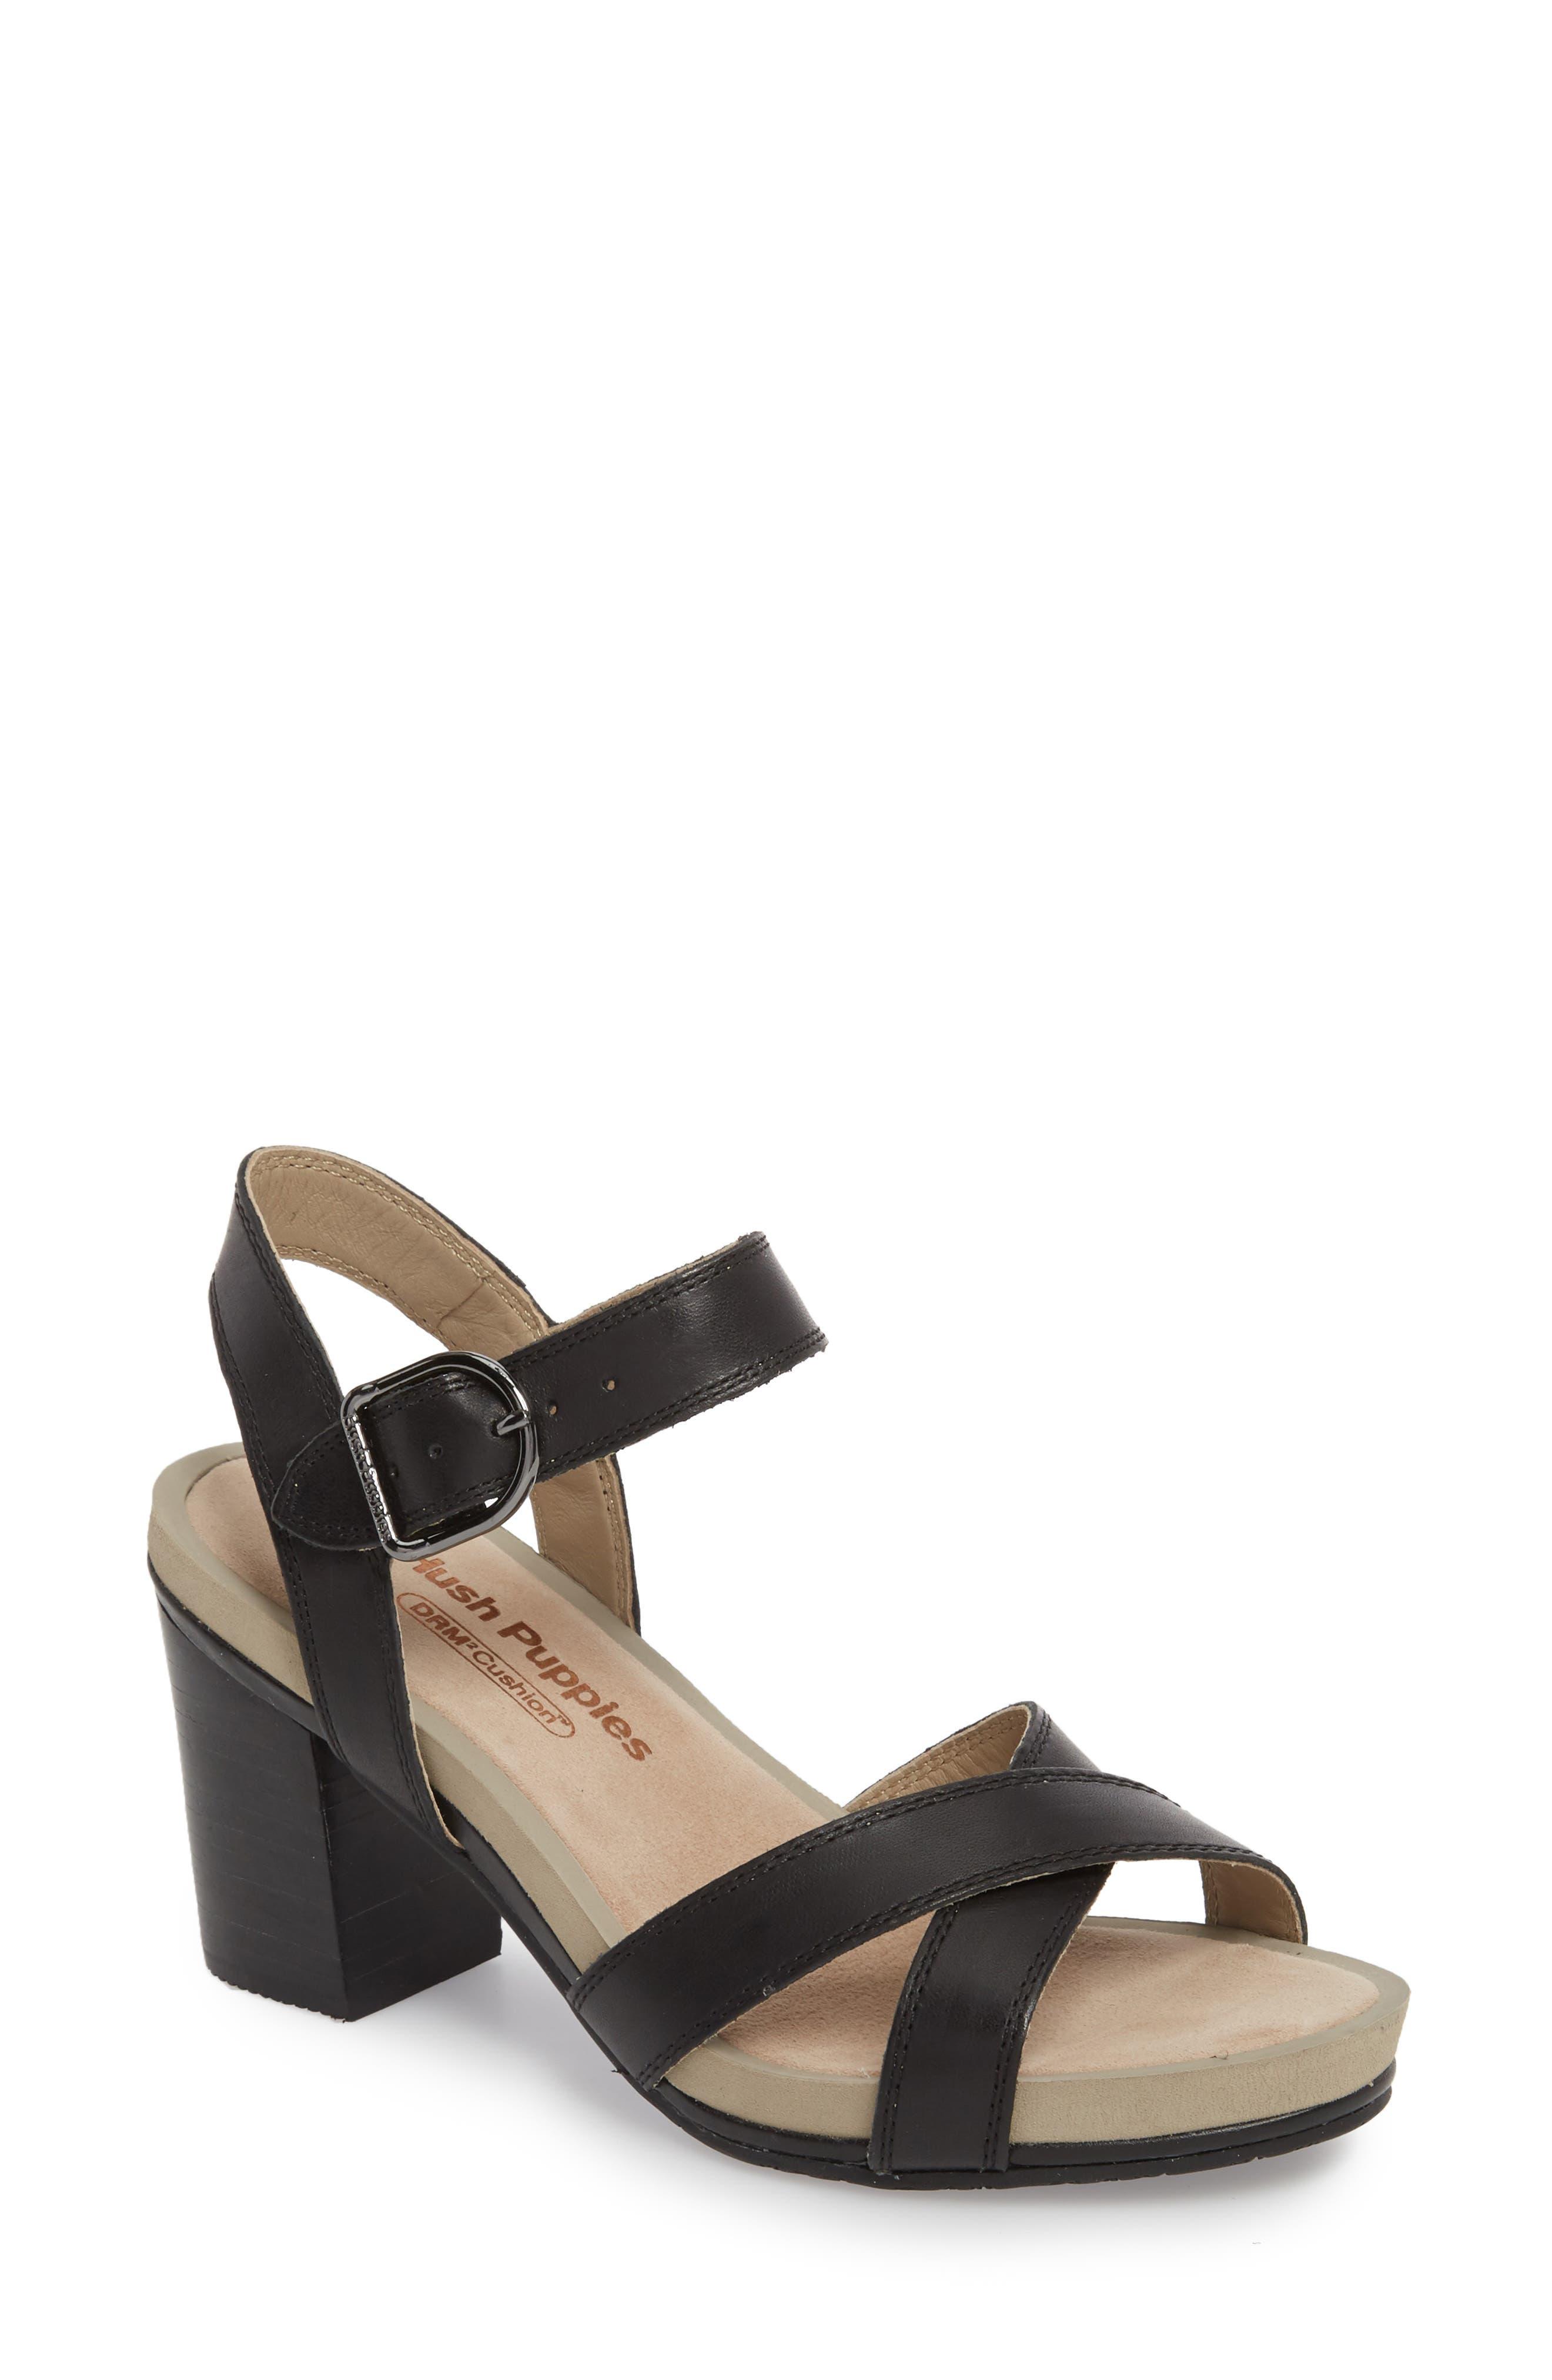 Mariska Block Heel Sandal,                         Main,                         color,